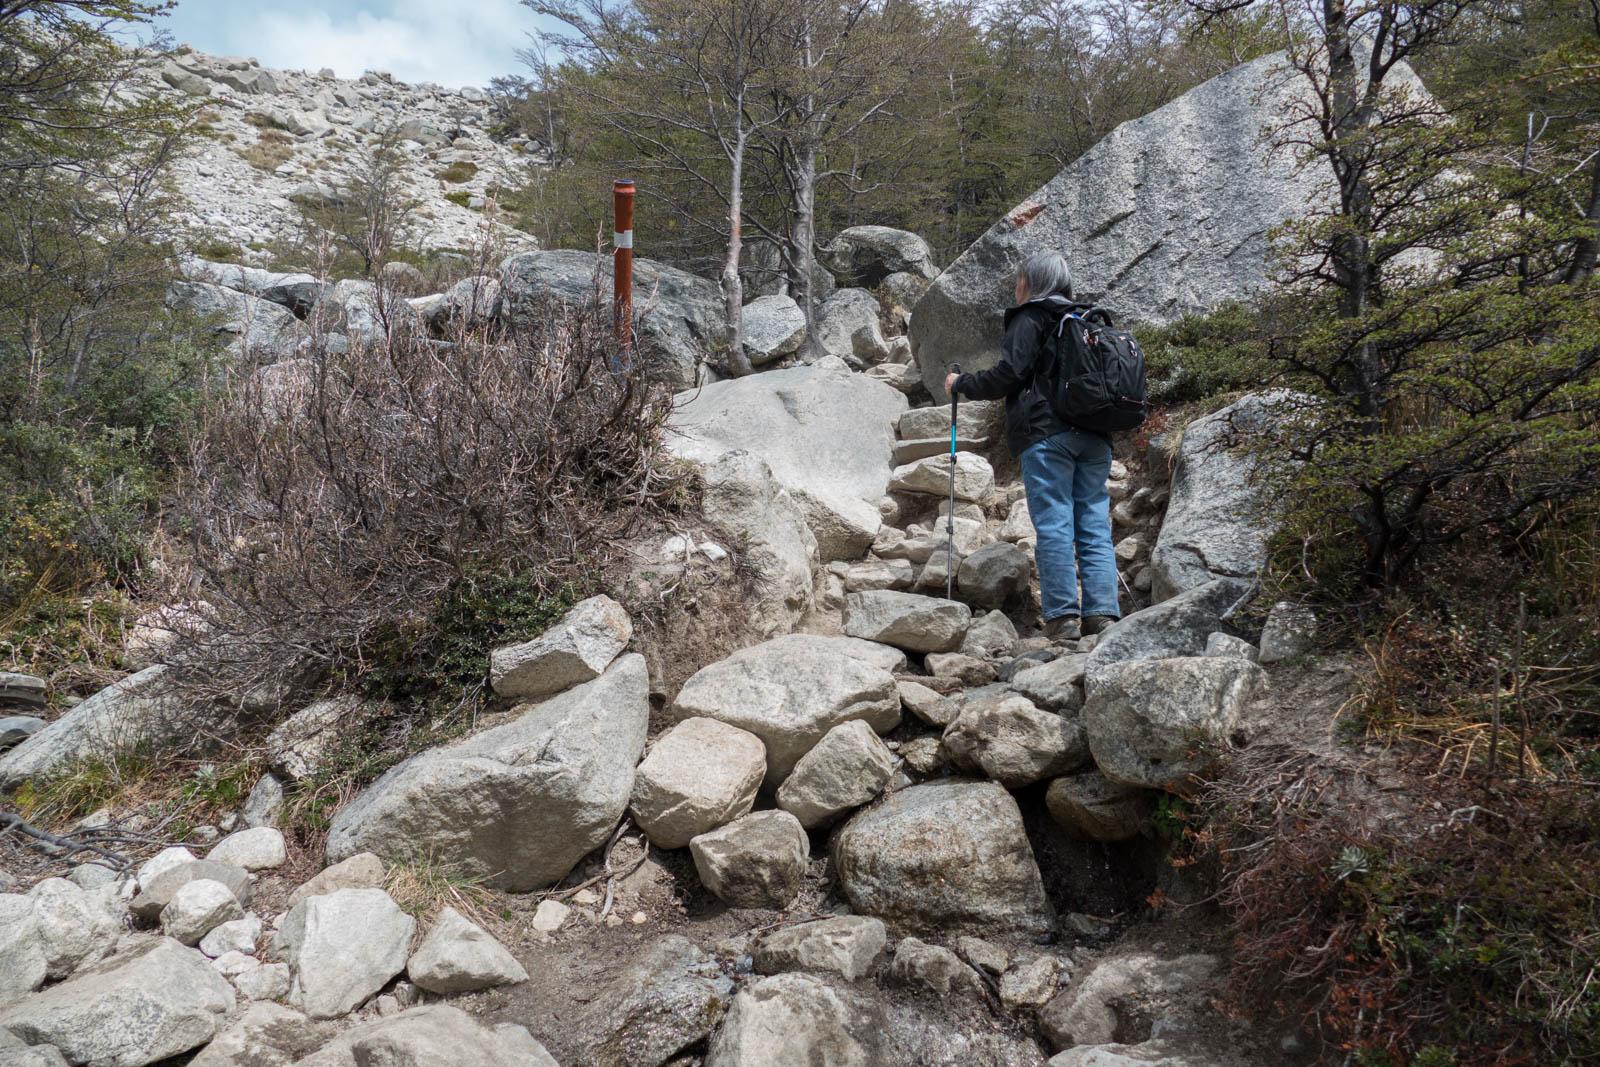 Scrambling up rocks and boulders on the last bit